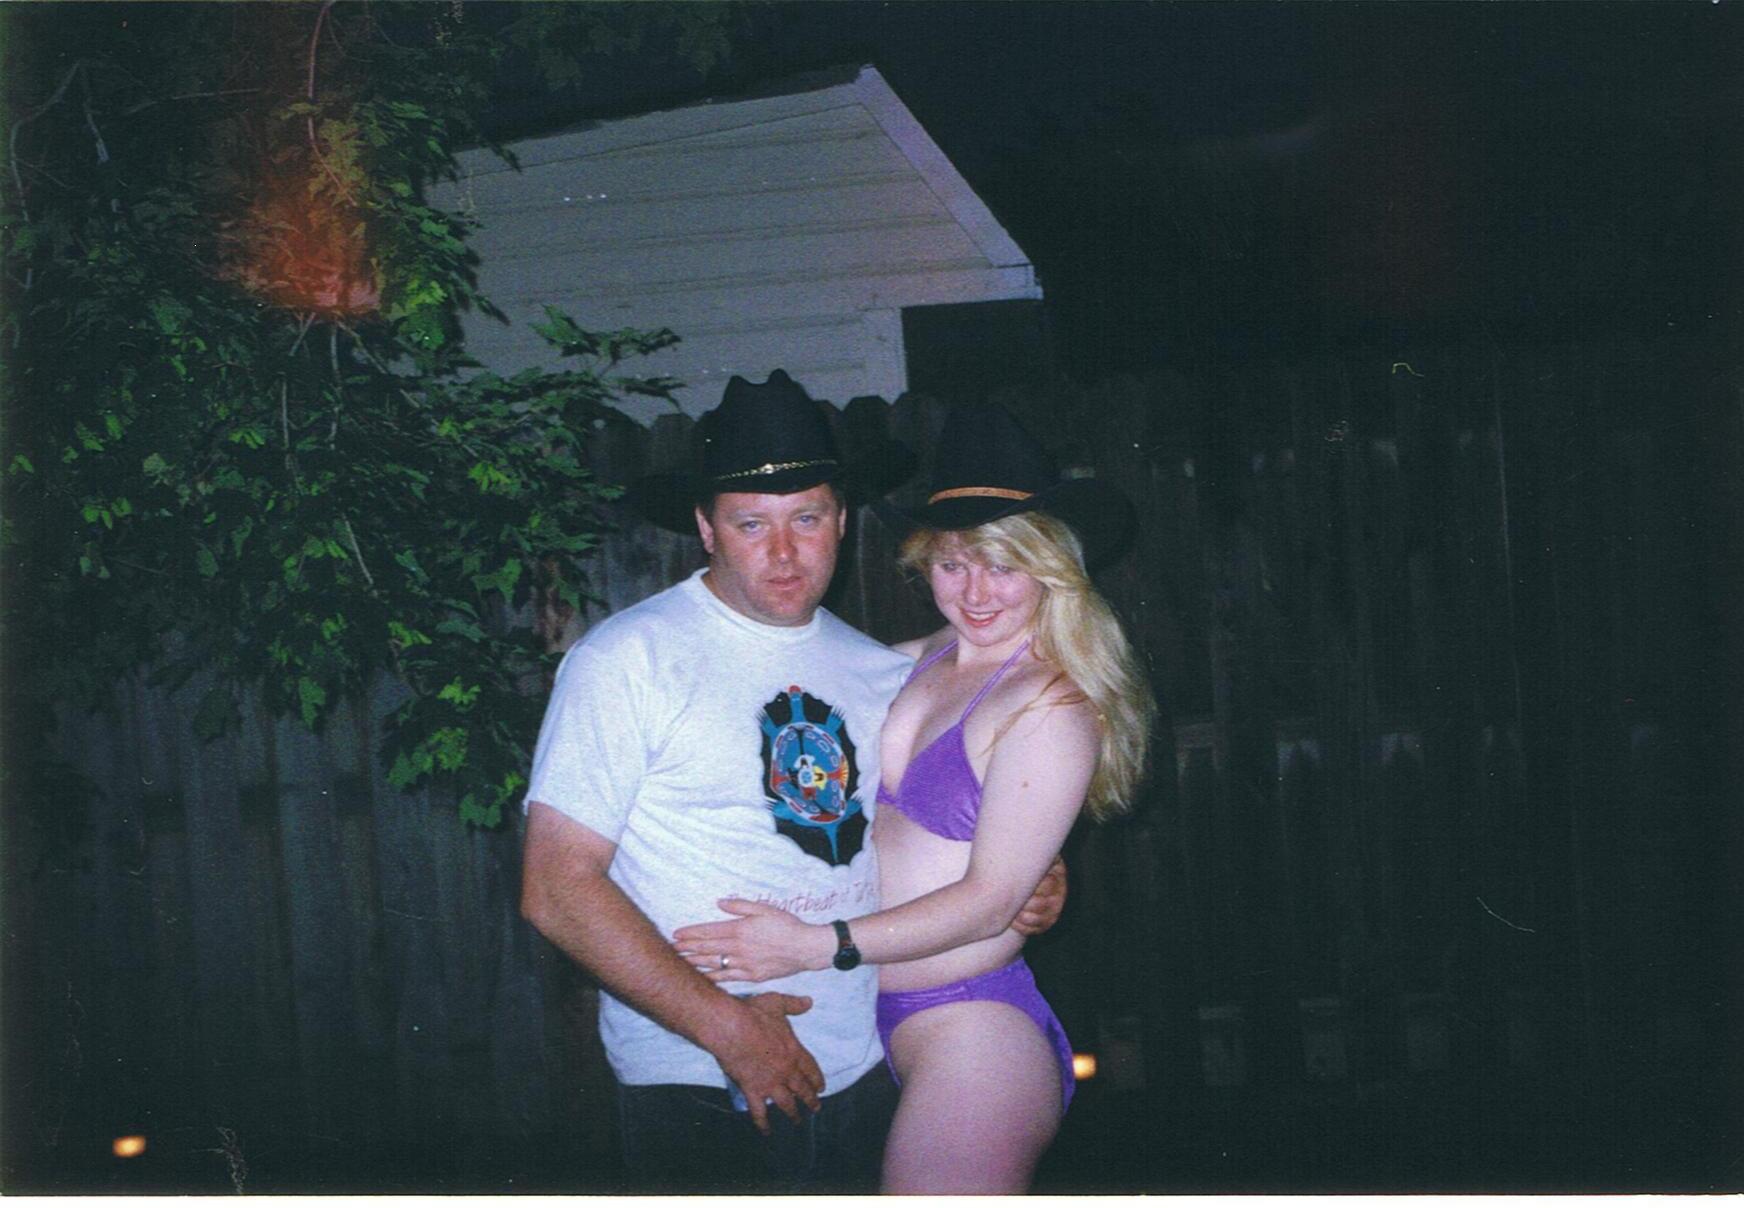 Dianna_and_Billy _June_1999 _in_Squids_ Backyard.JPG